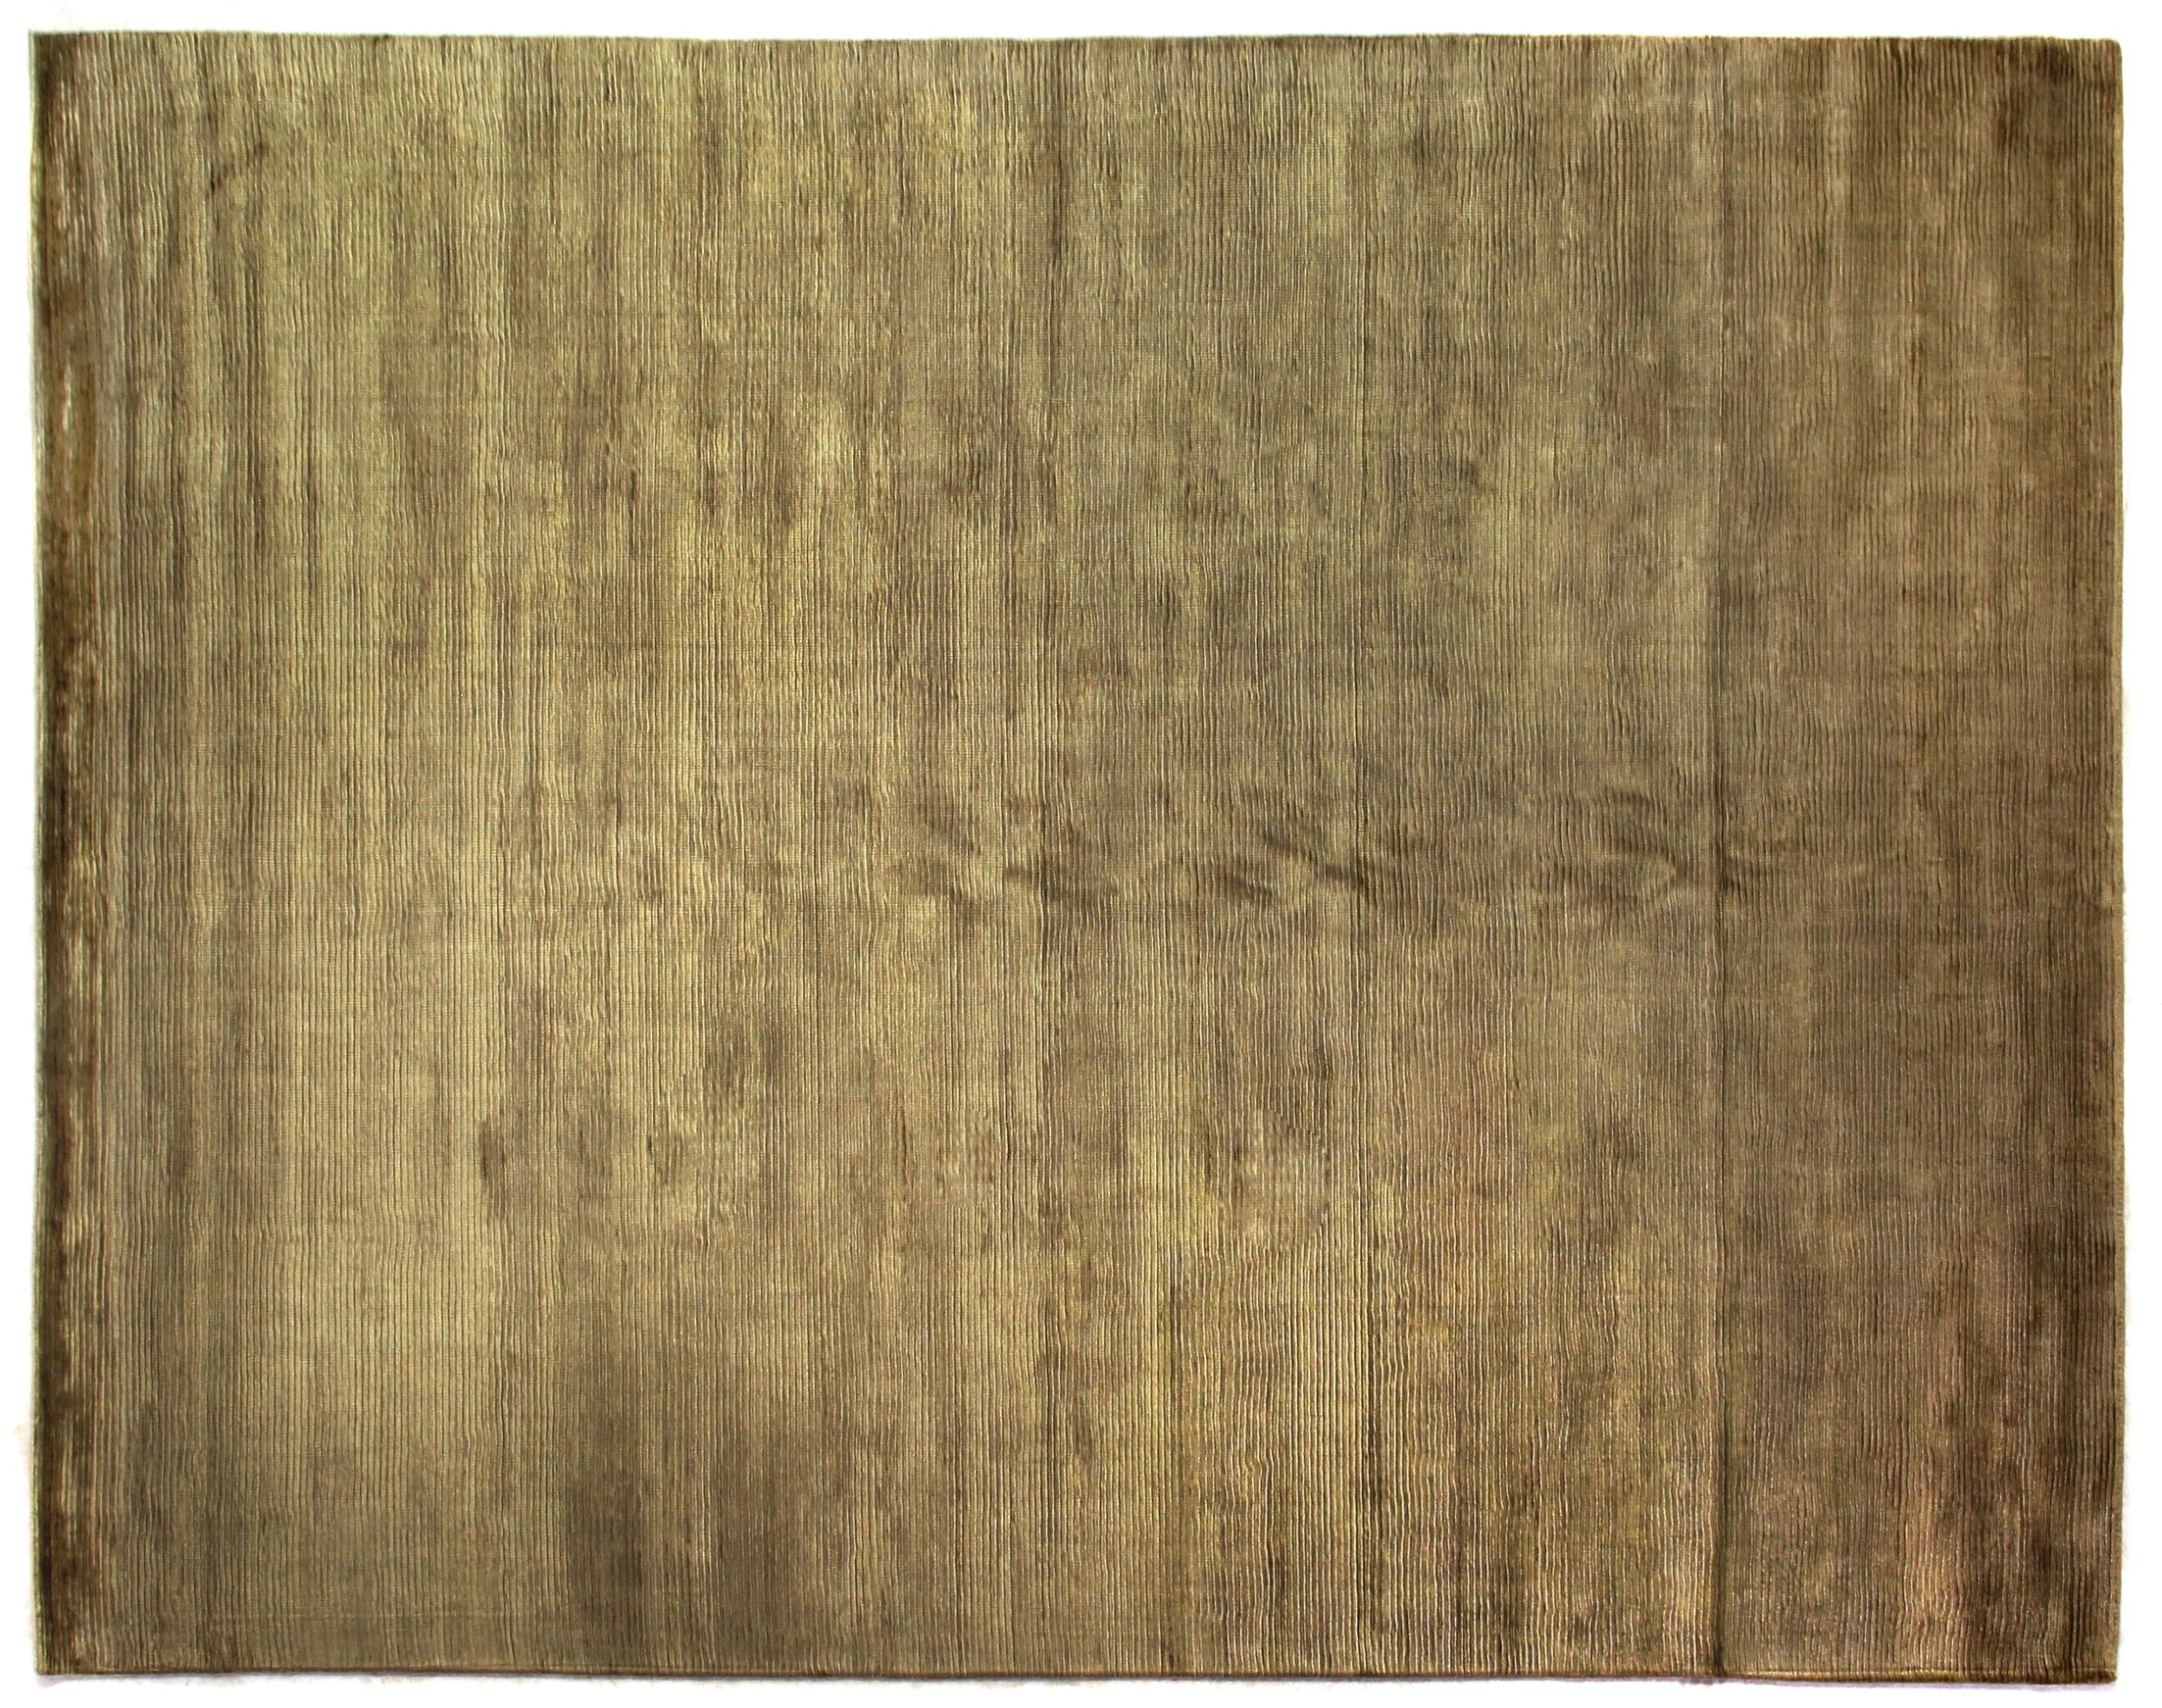 Dove Courduroy Hand-Woven Mushroom Area Rug Rug Size: 8' x 10'